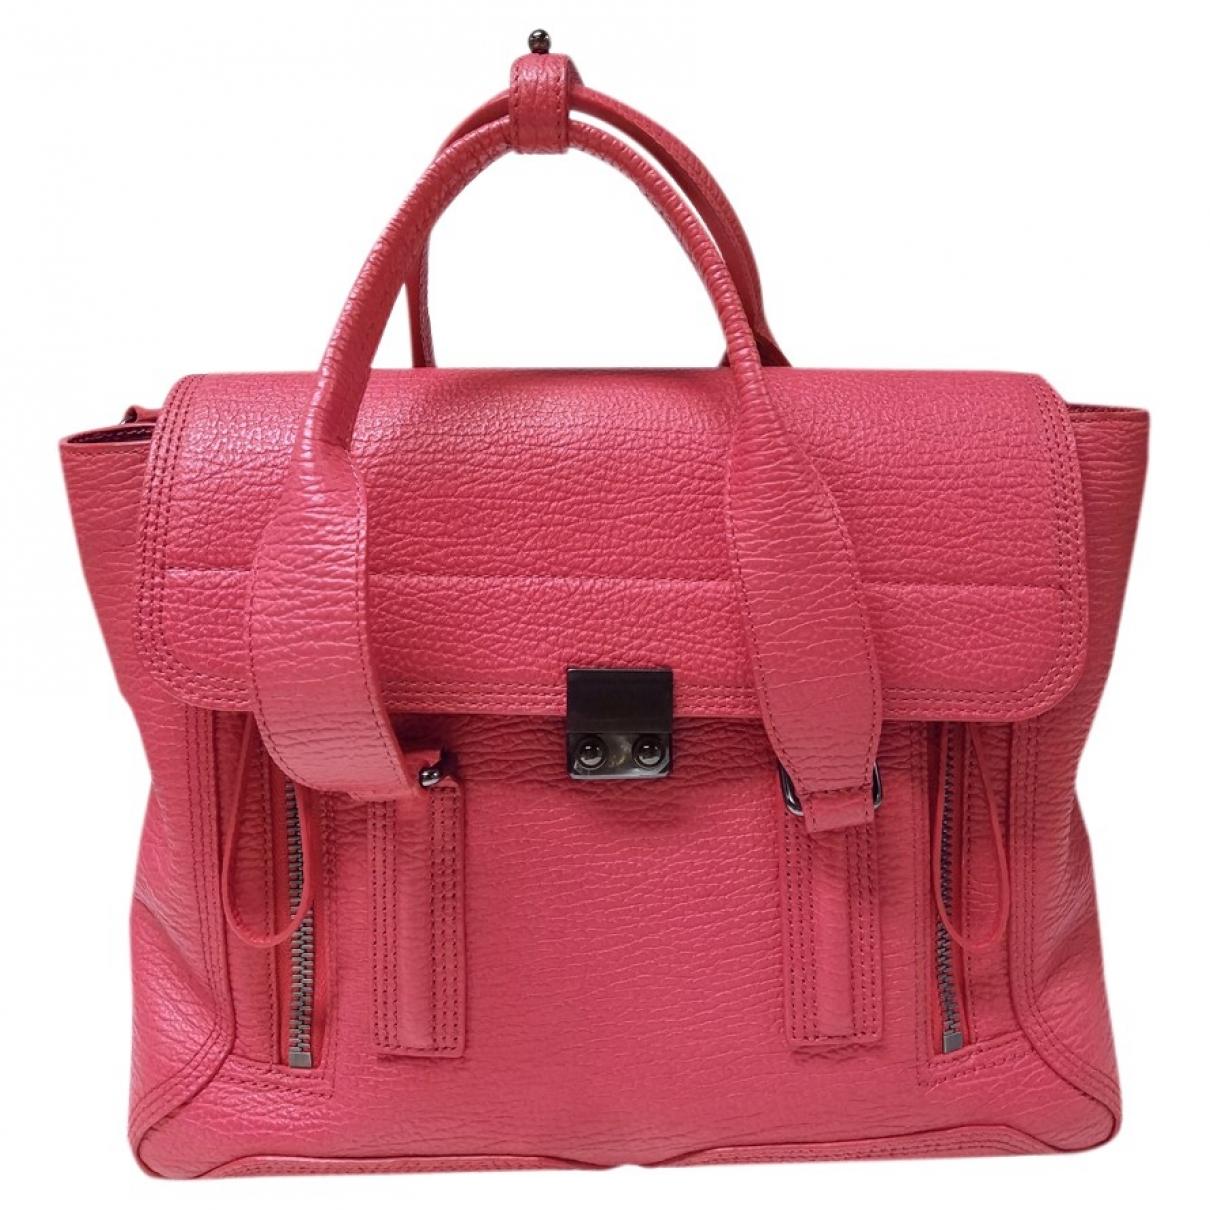 3.1 Phillip Lim Pashli Handtasche in  Rot Leder